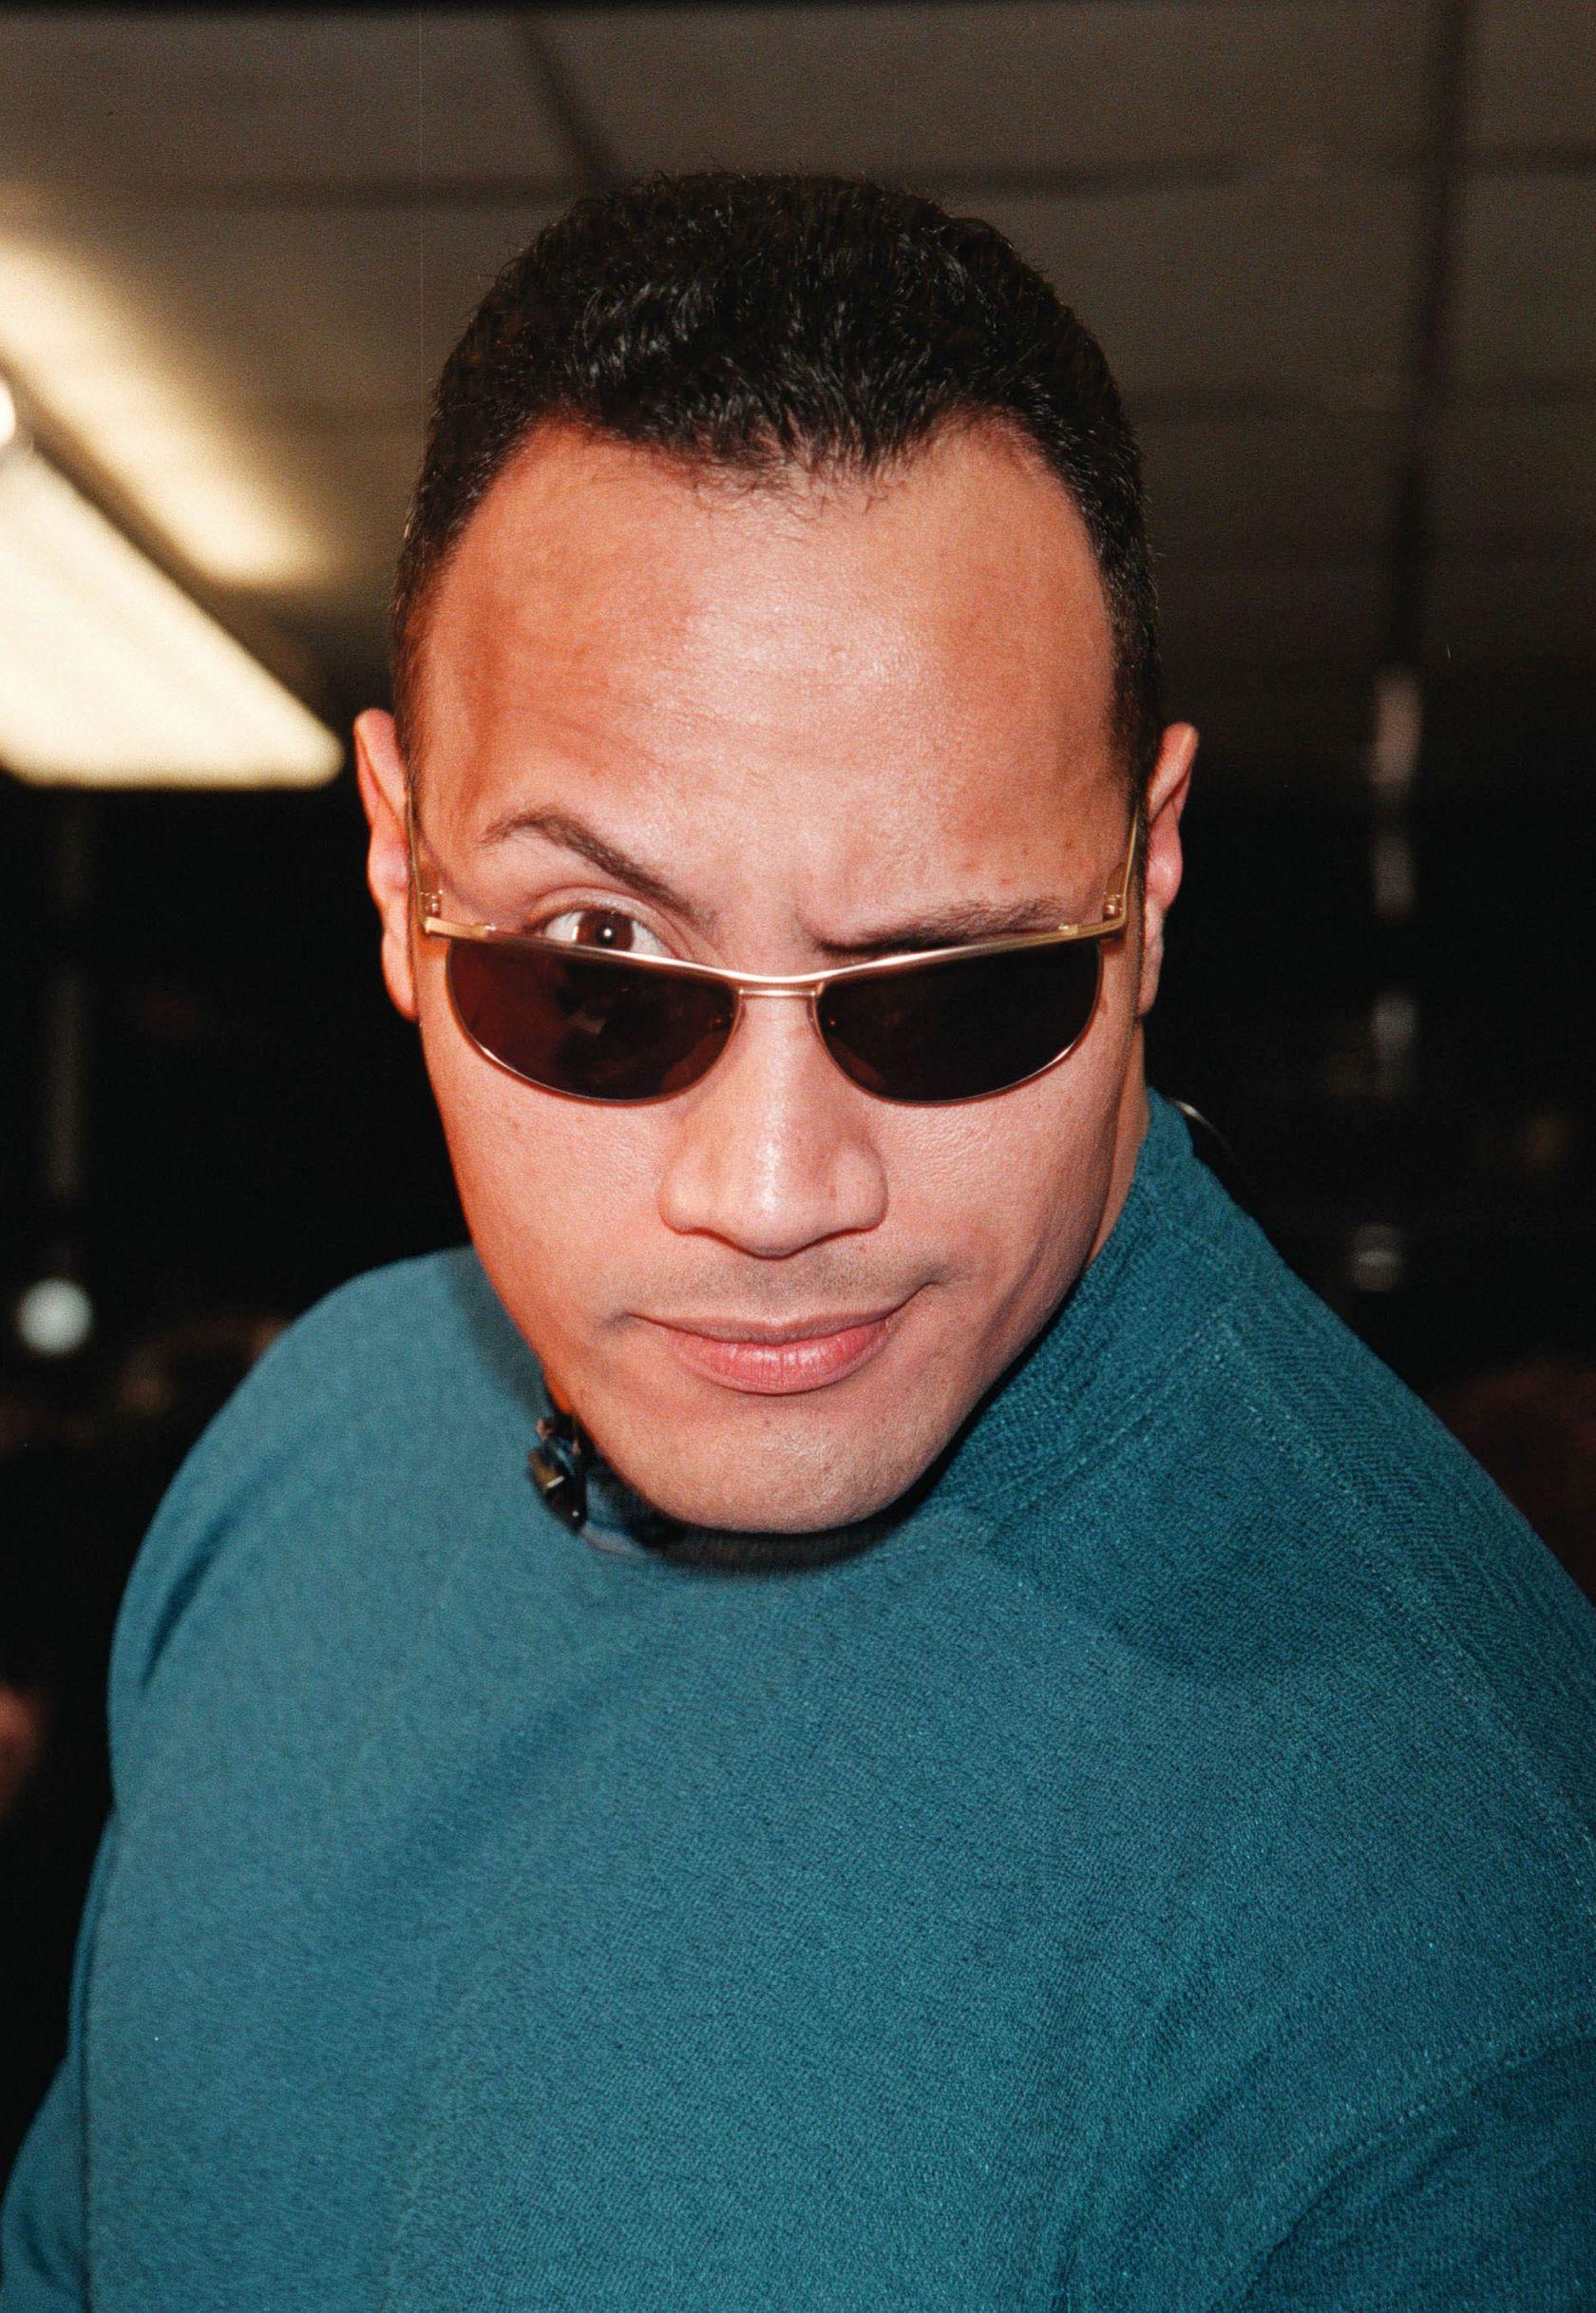 The Rock Neacutee Dwayne Johnson Weird Crushes The Cut